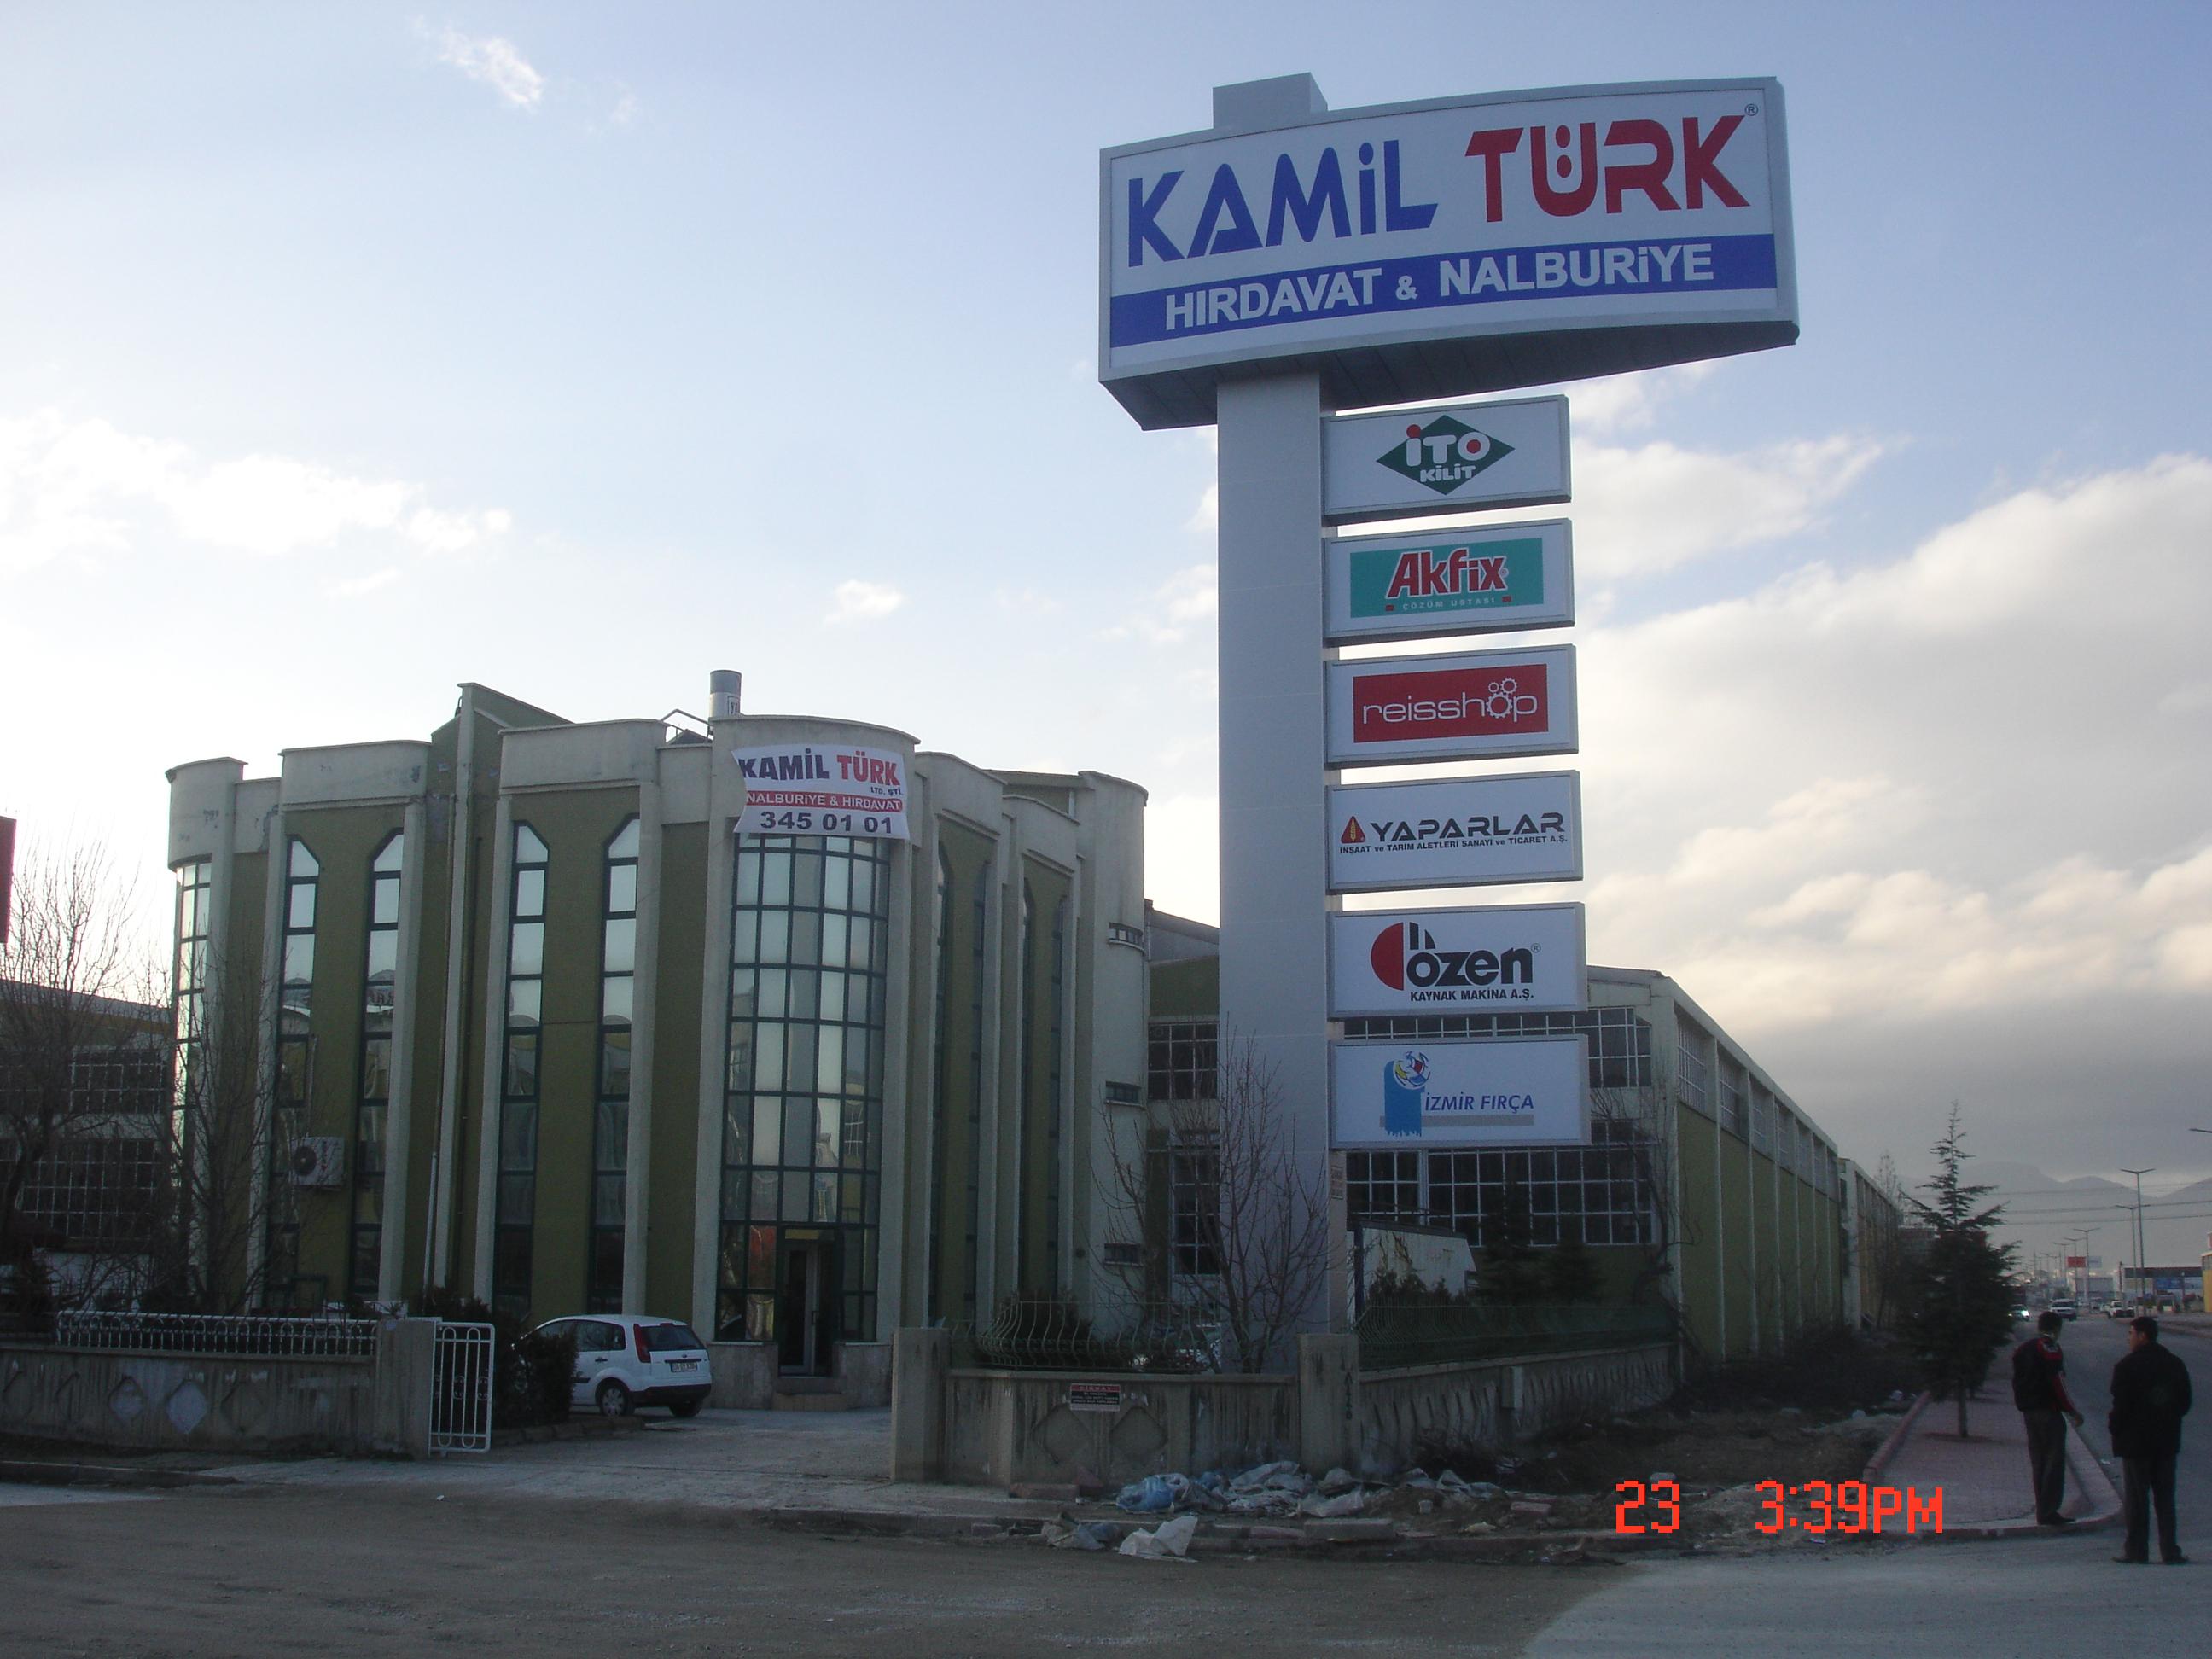 KAMİL TÜRK HIRDAVAT